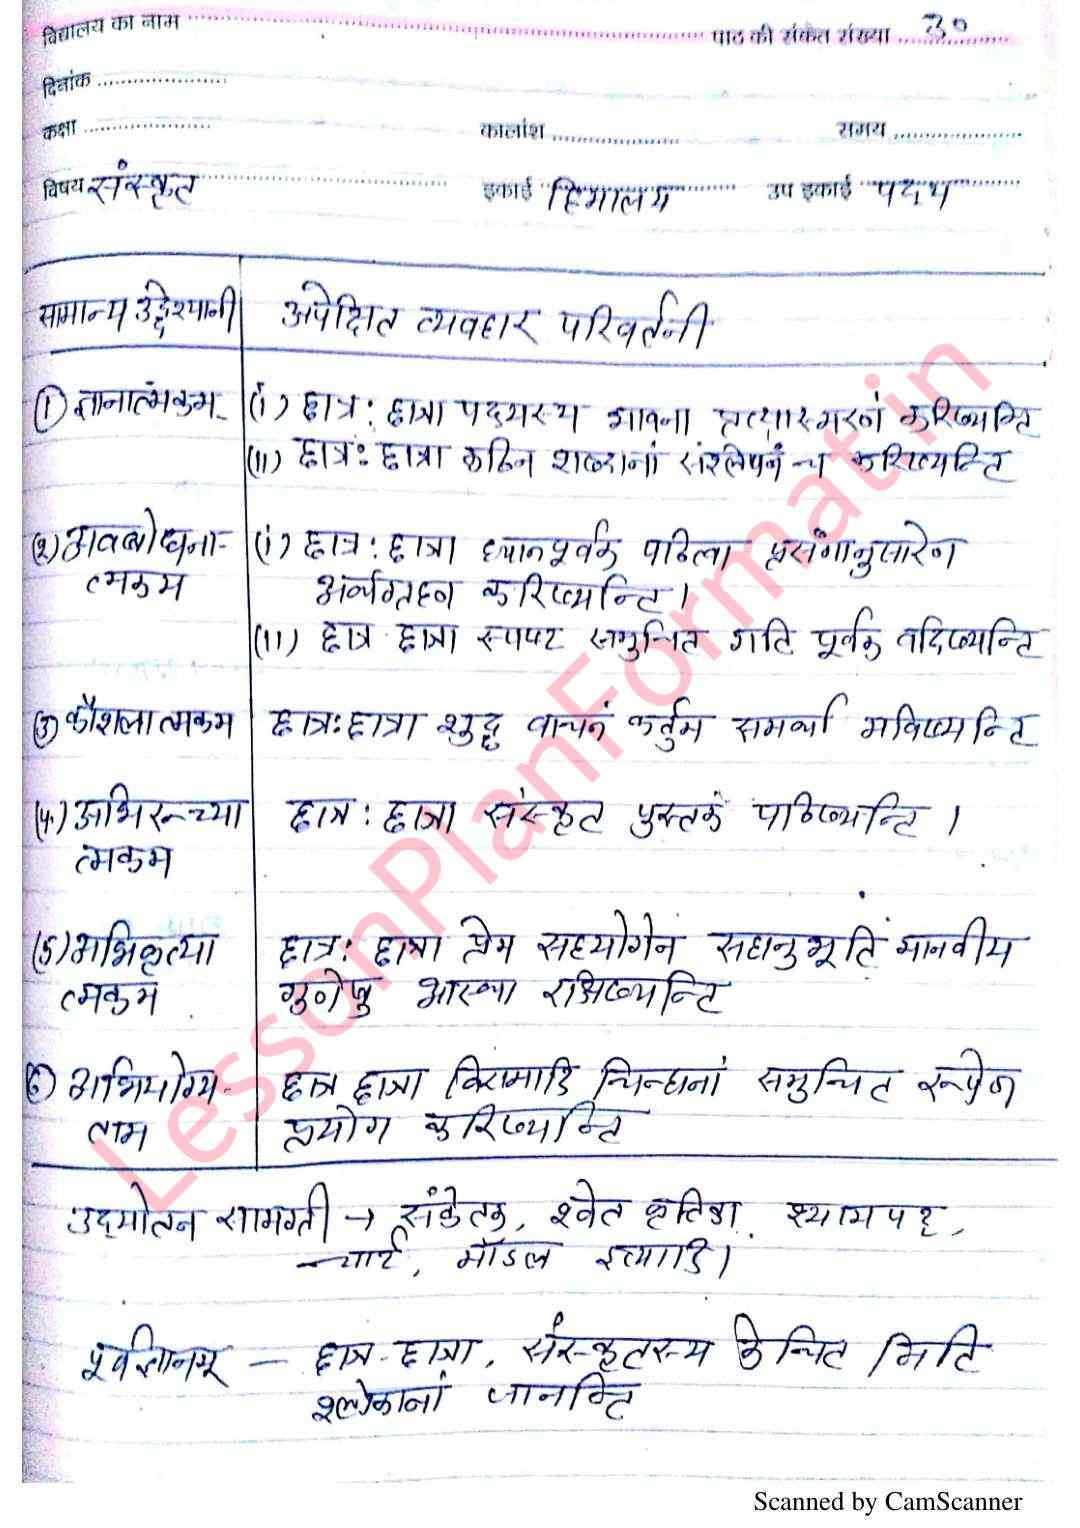 Sanskrit Lesson Plan | संस्कृत पाठ योजना | b.ed-bstc